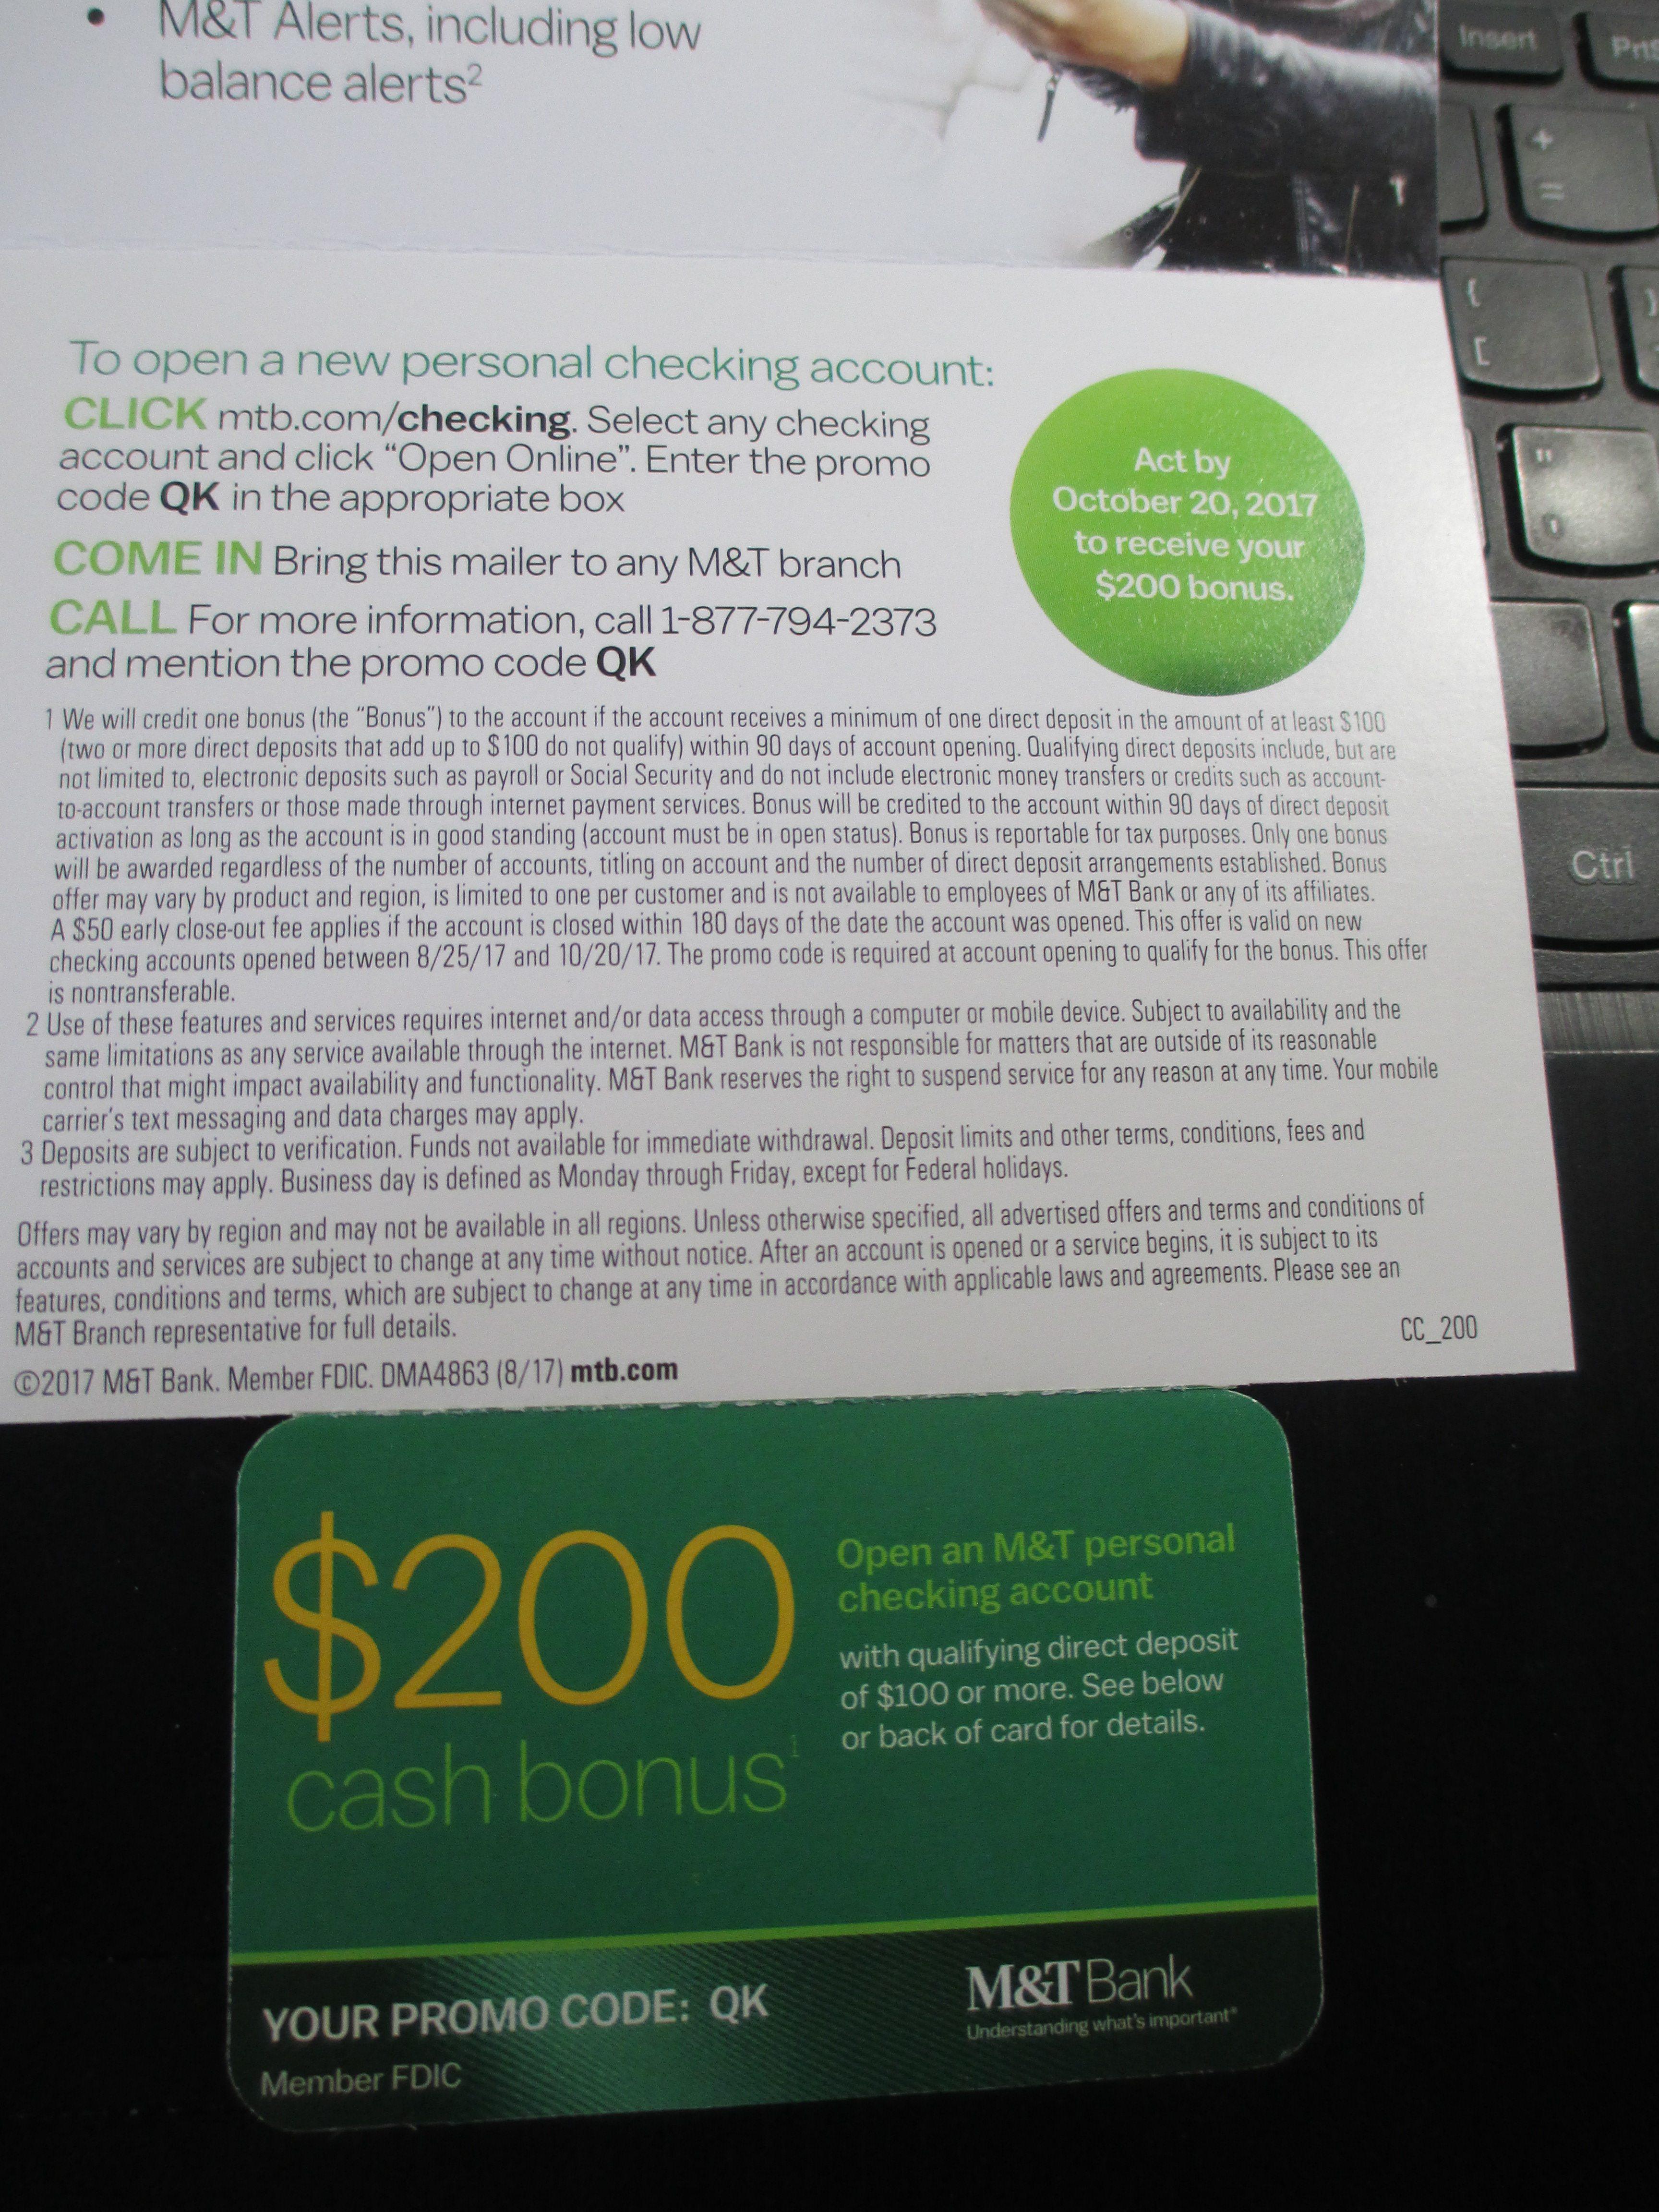 [YMMV] M&T Bank $200 Checking Bonus QK – Available Online [CT, DC, DE, MD, NJ, NY, PA, VA, WV] - Doctor Of Credit